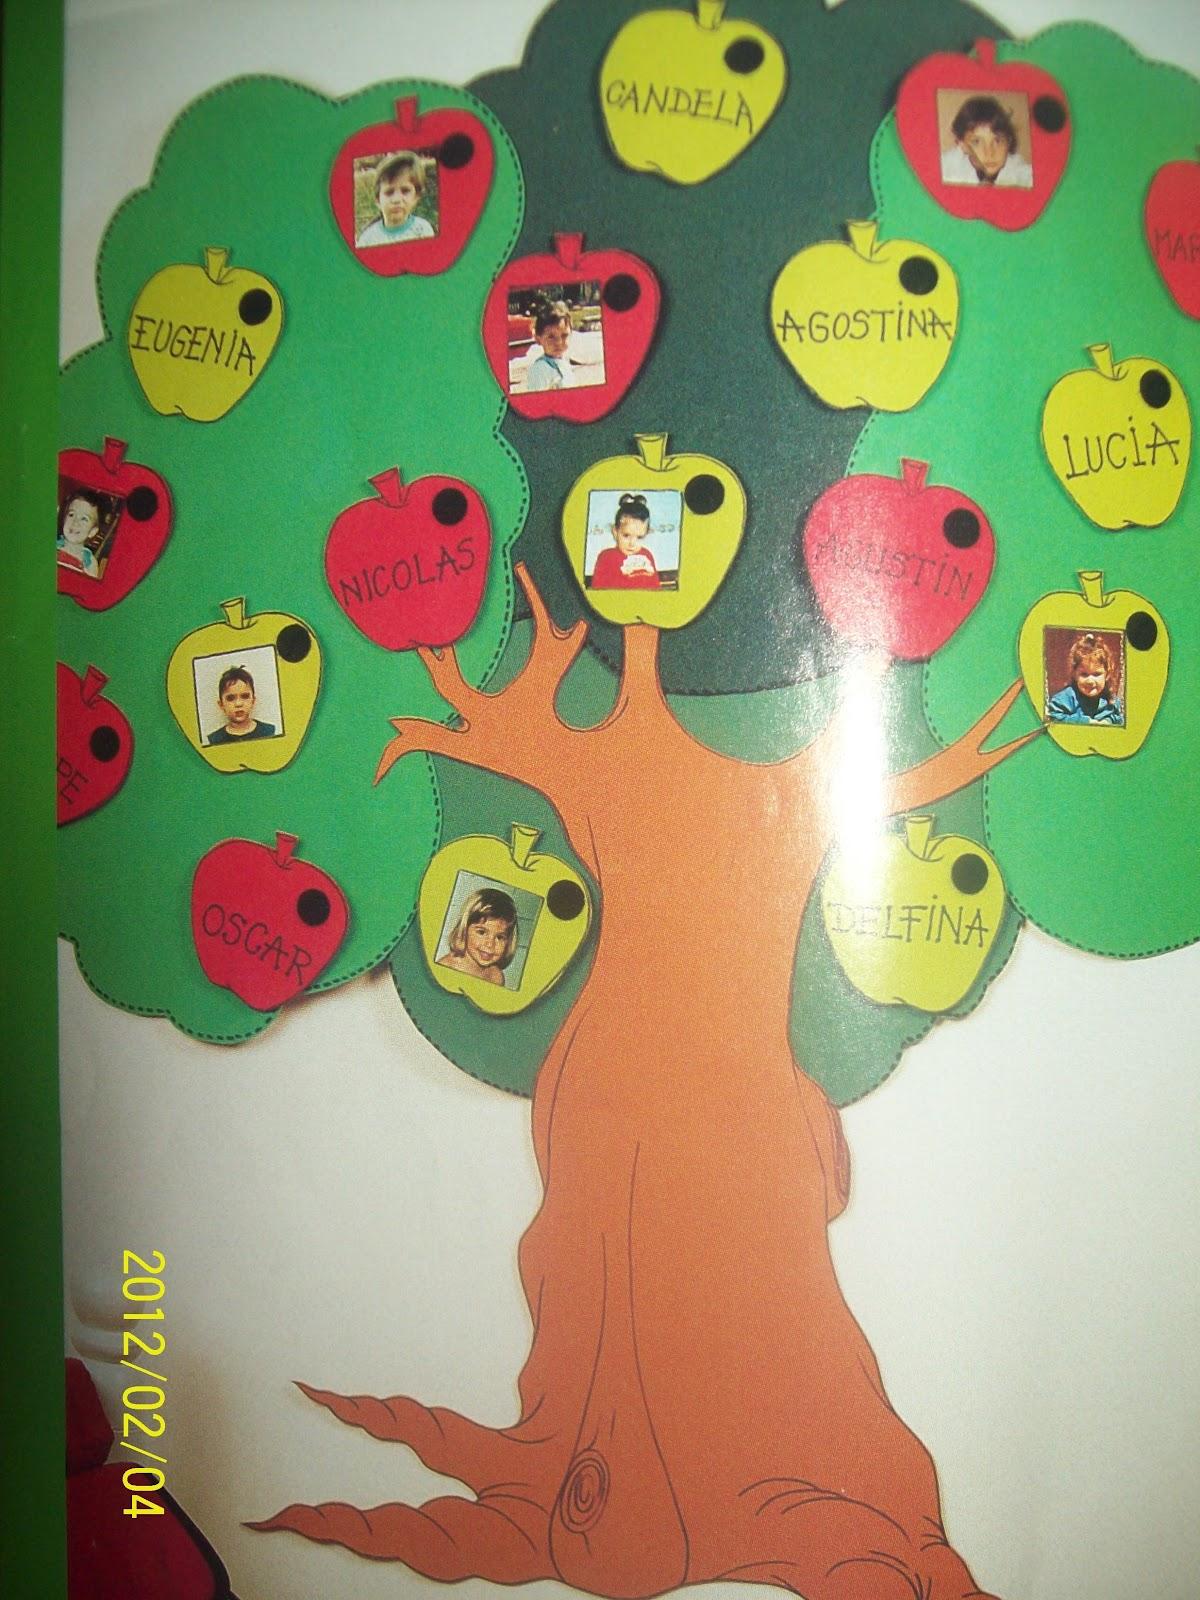 decoracao de sala educacao infantil – Doitricom -> Decoracao Banheiro Educacao Infantil